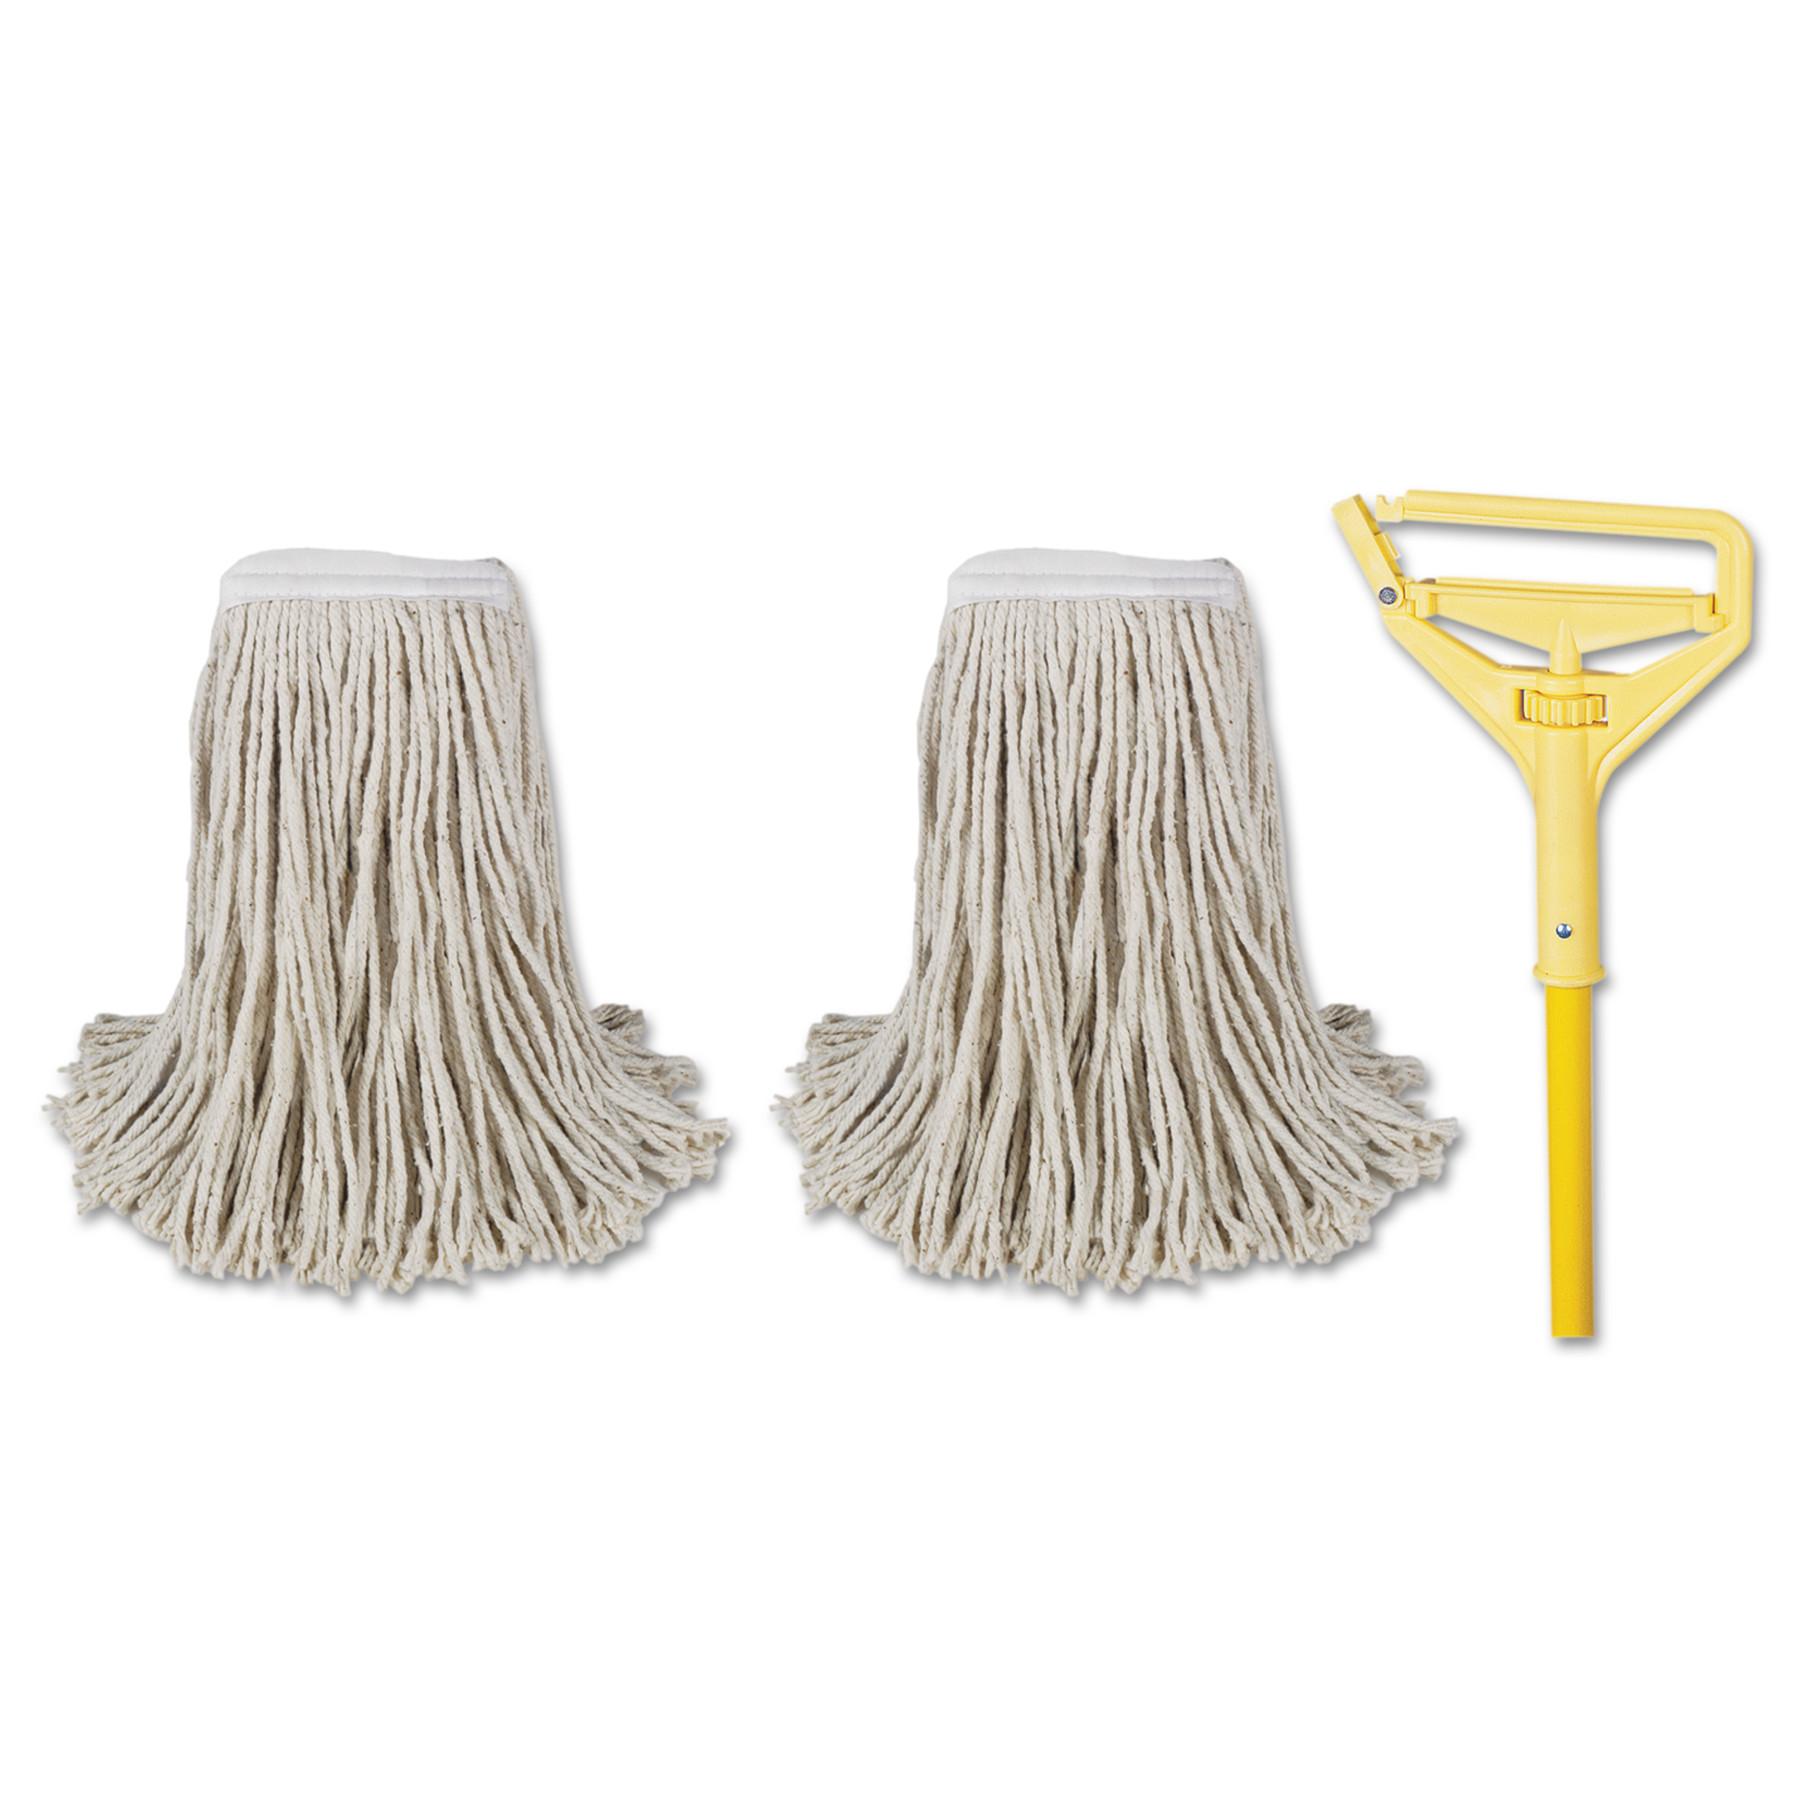 "Boardwalk Cut-End Mop Kits, #24, Natural, 60"" Metal/Plastic Handle, Yellow -BWK5324C"